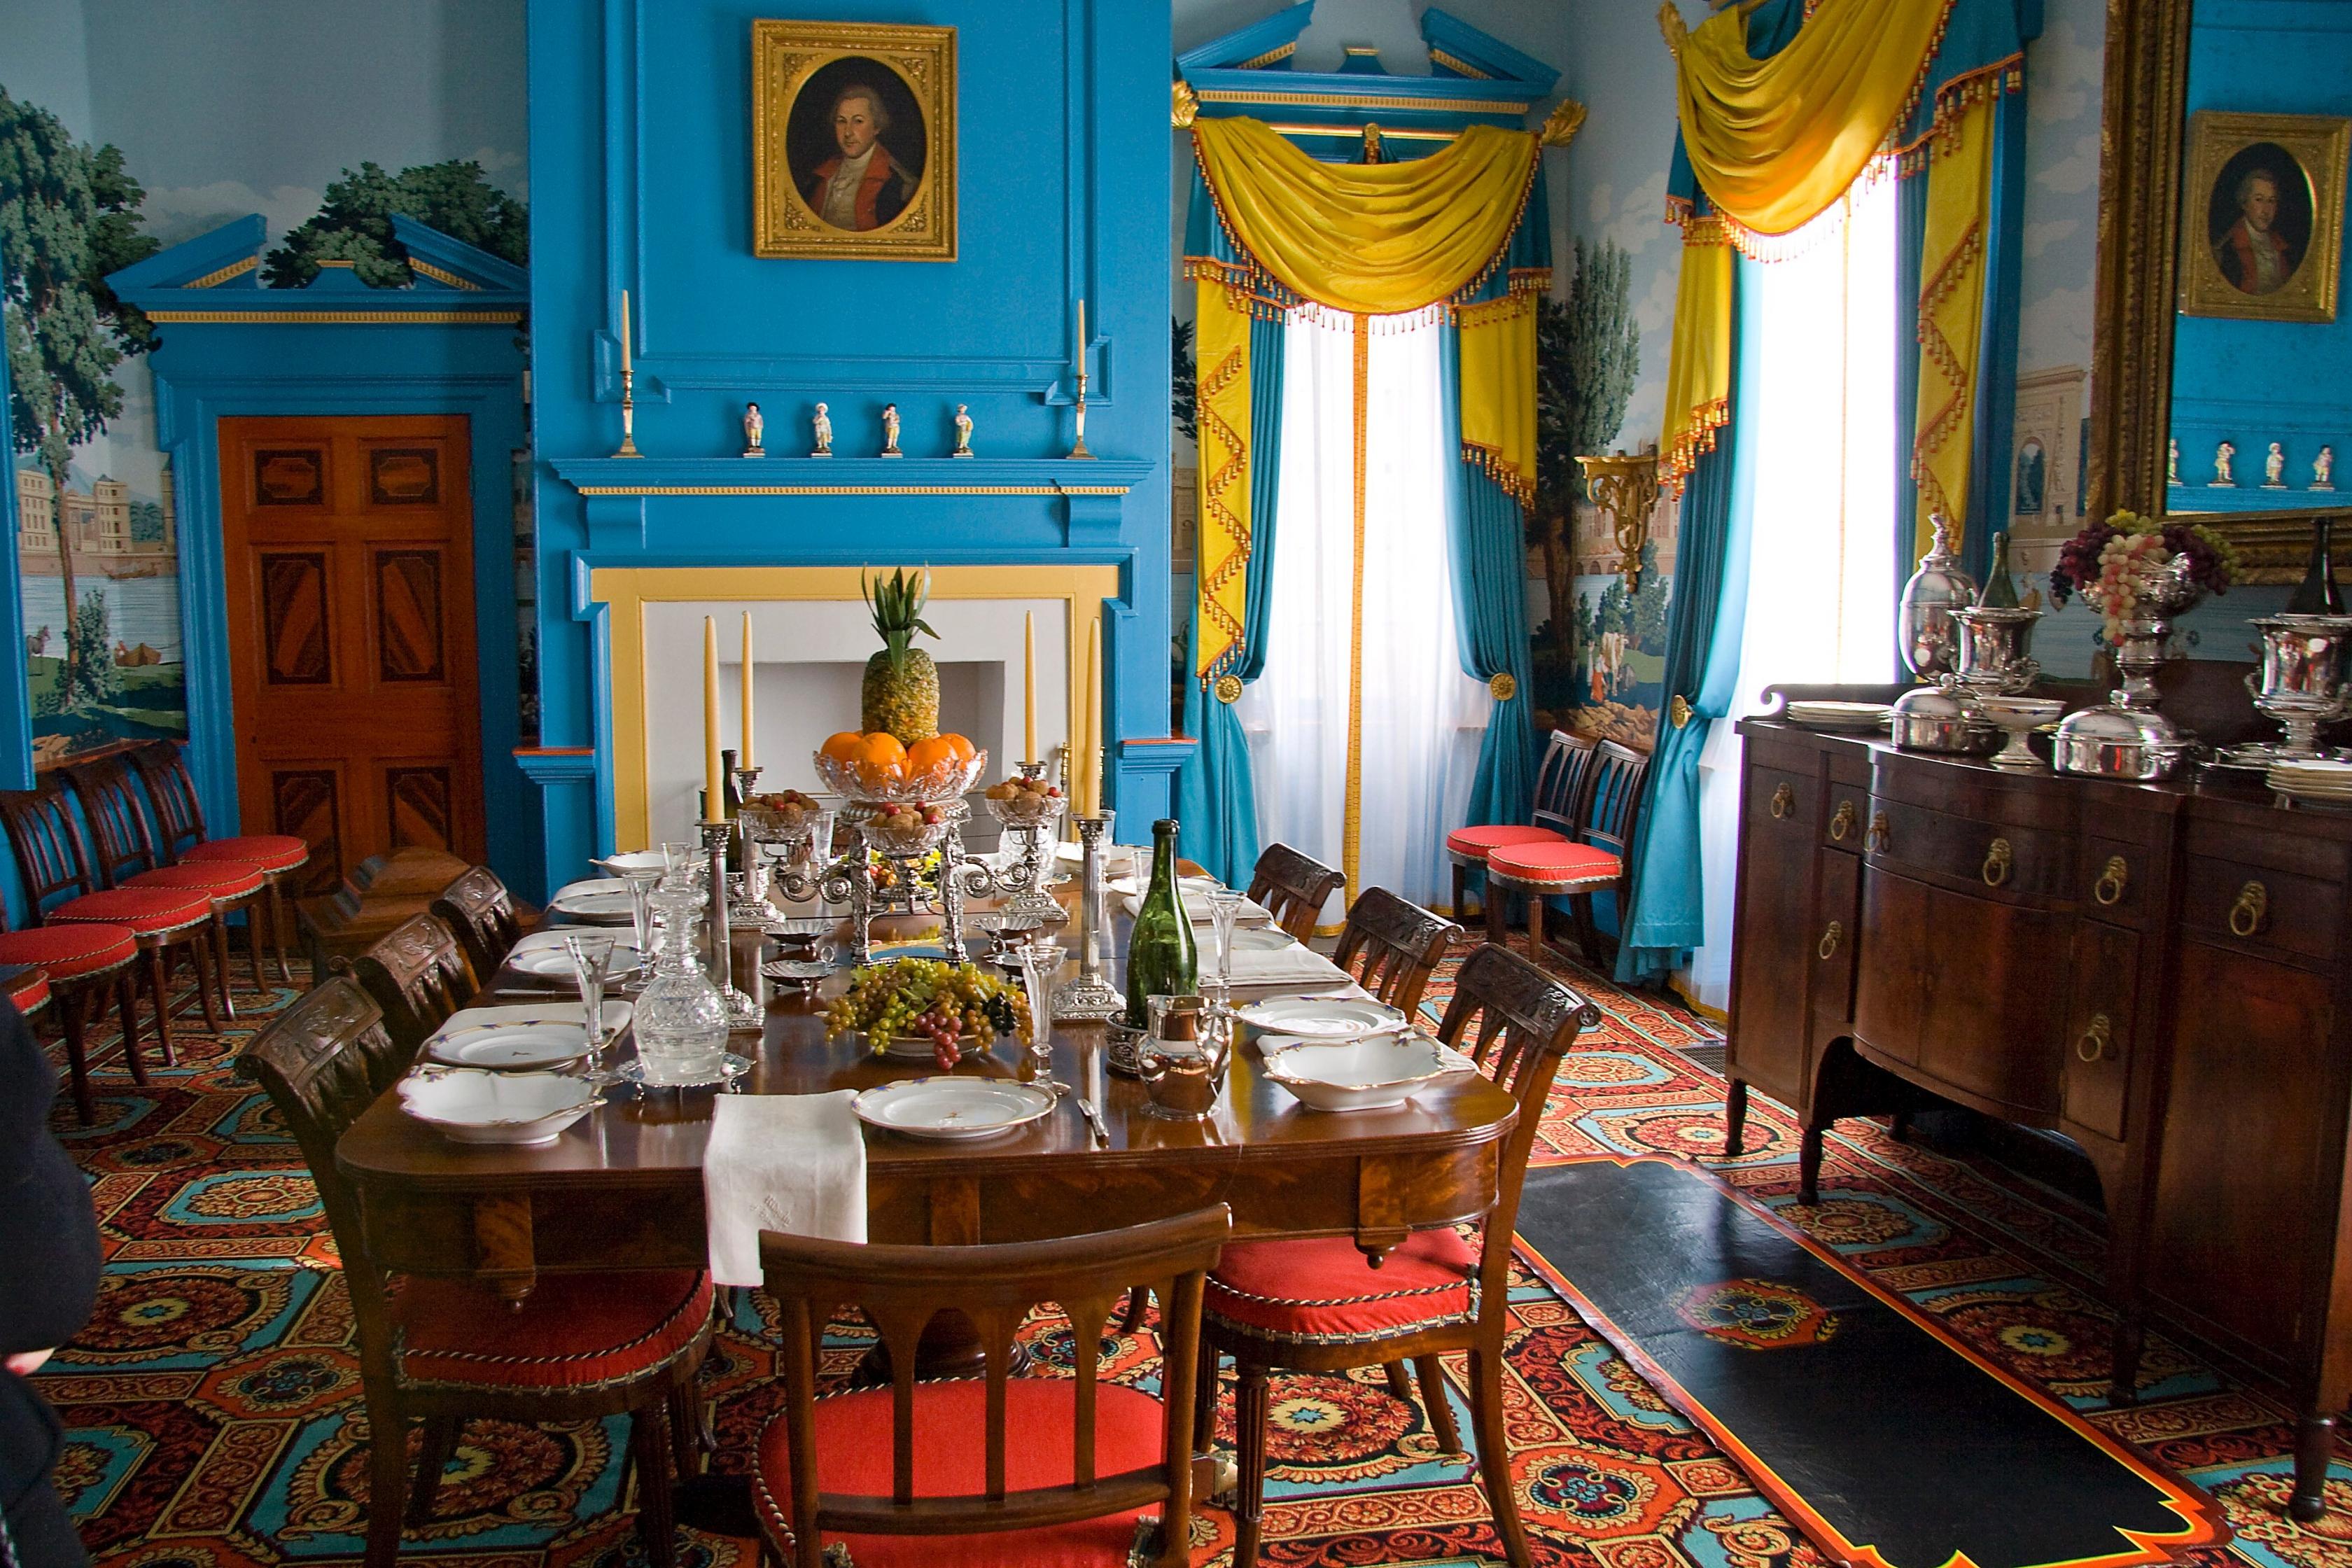 The dining at the mansion at Hampton National Park.